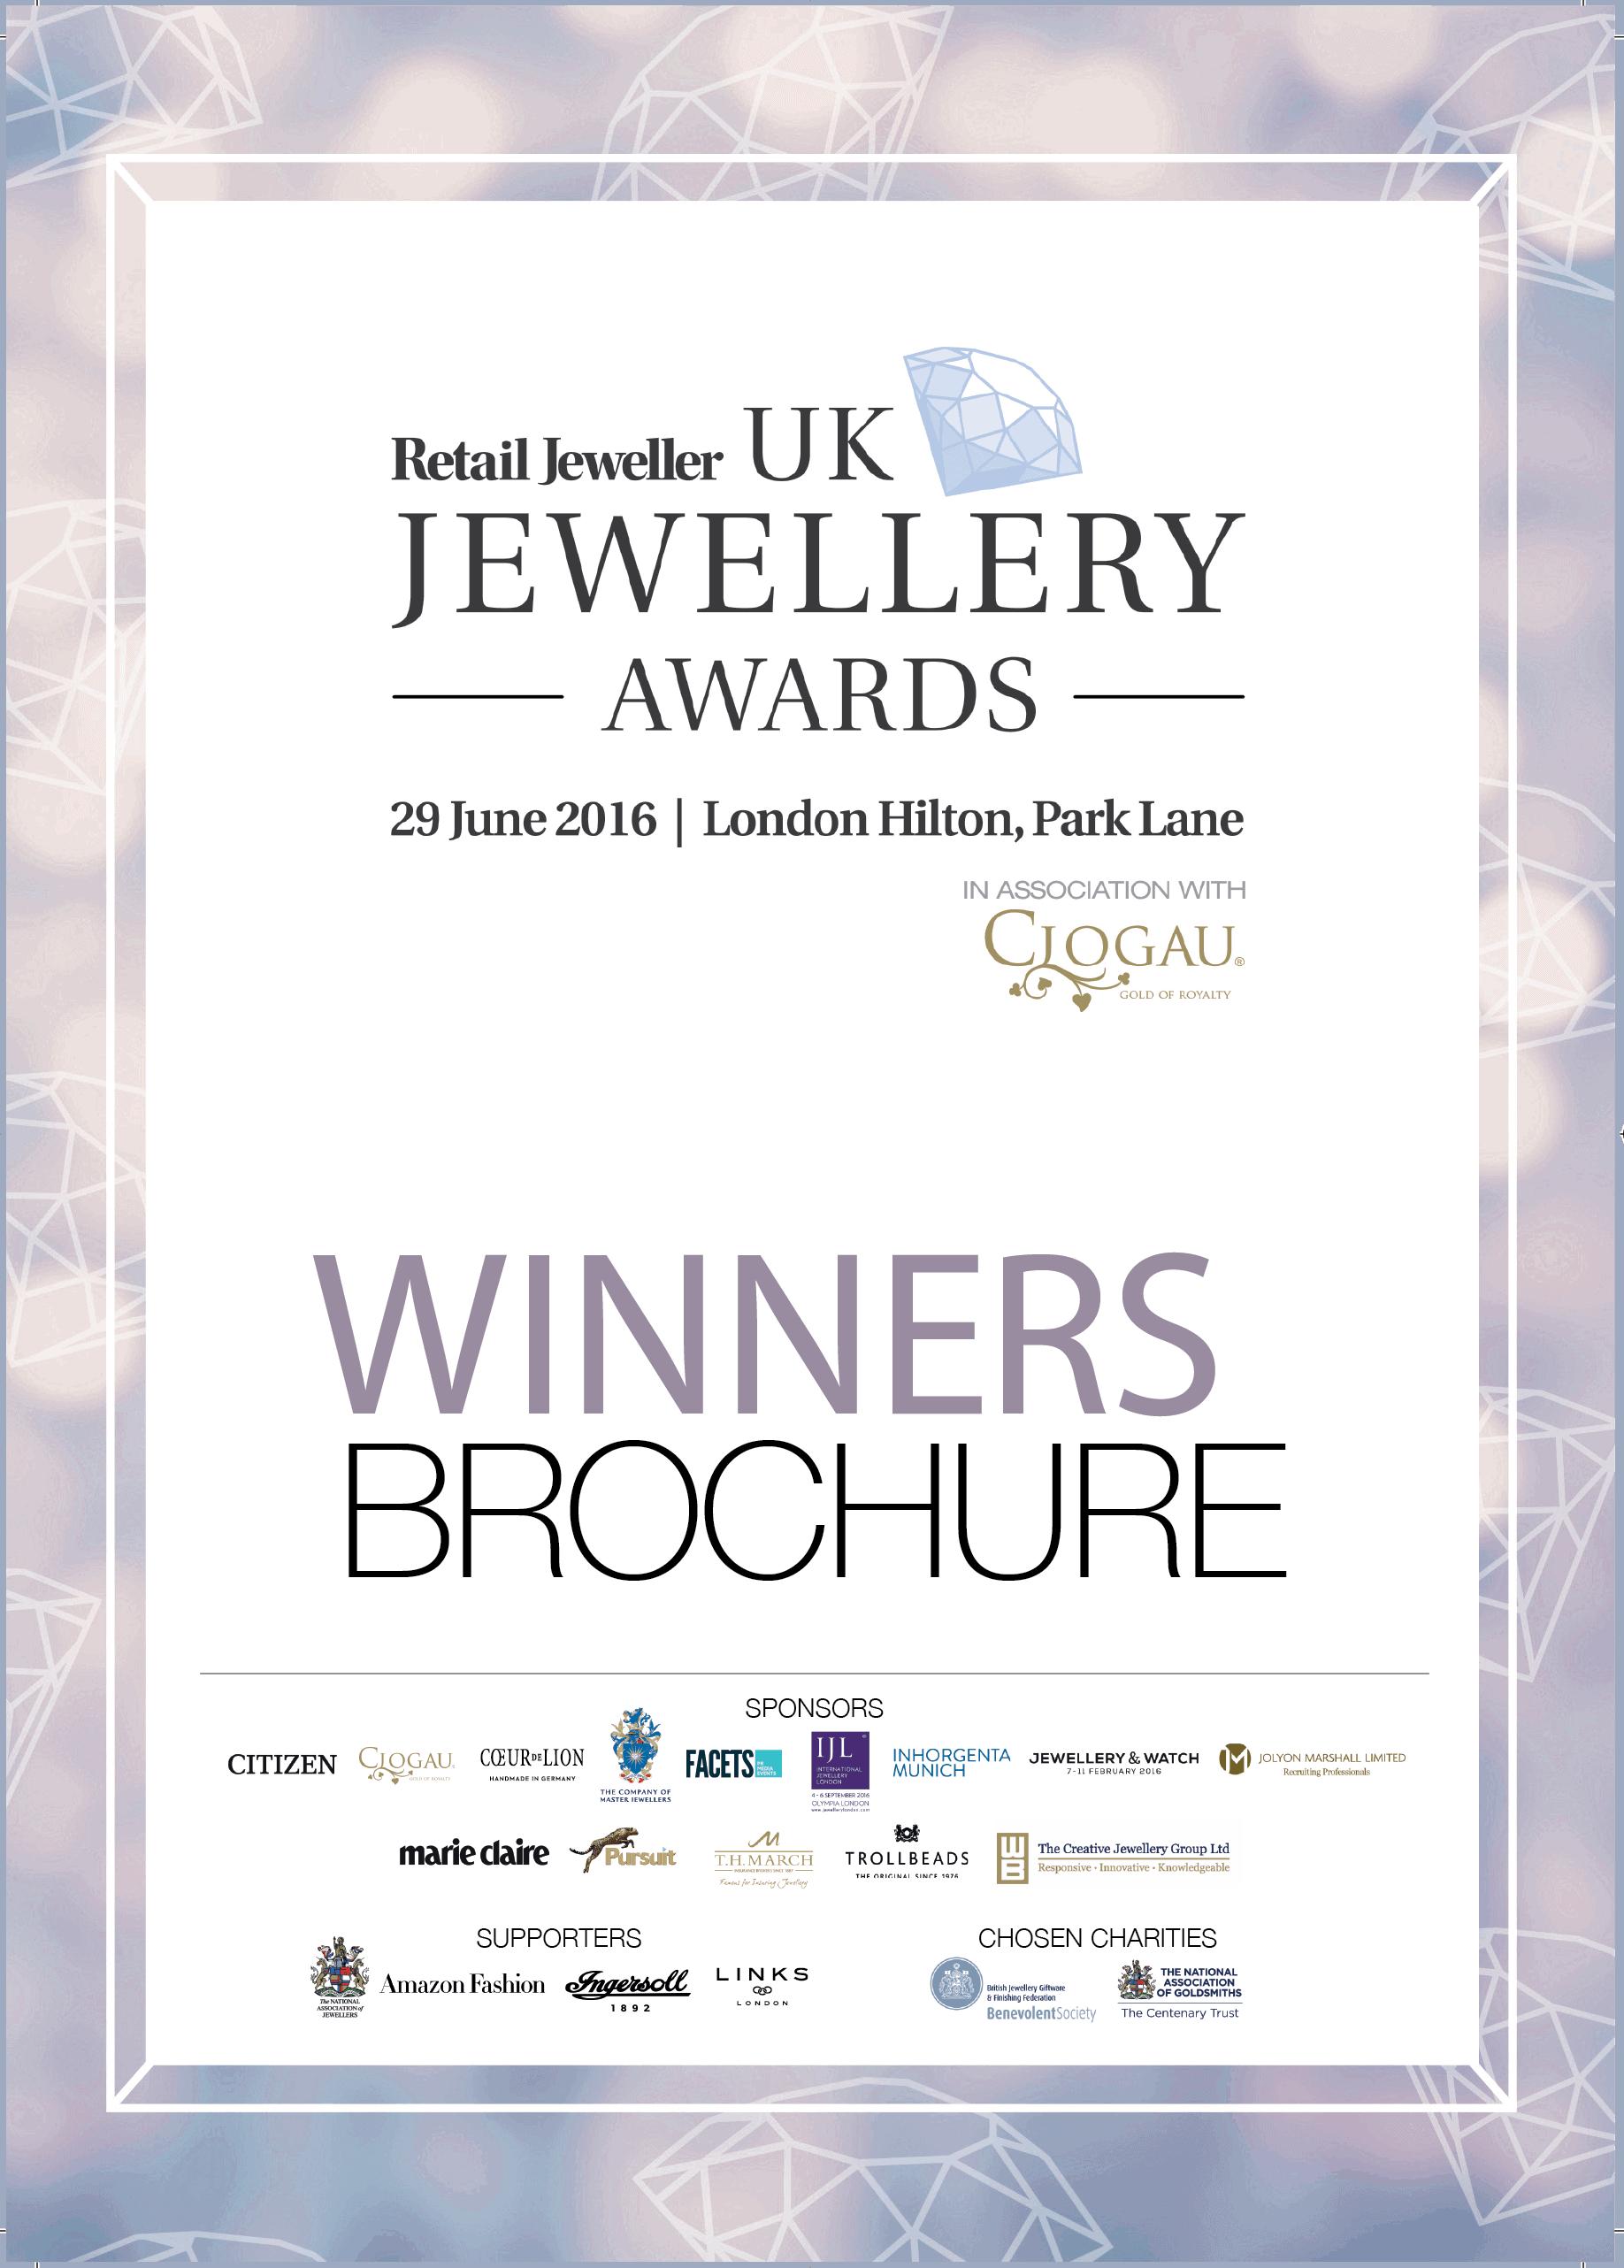 RJ Awards Brochure Cover 01, Helen Dimmick